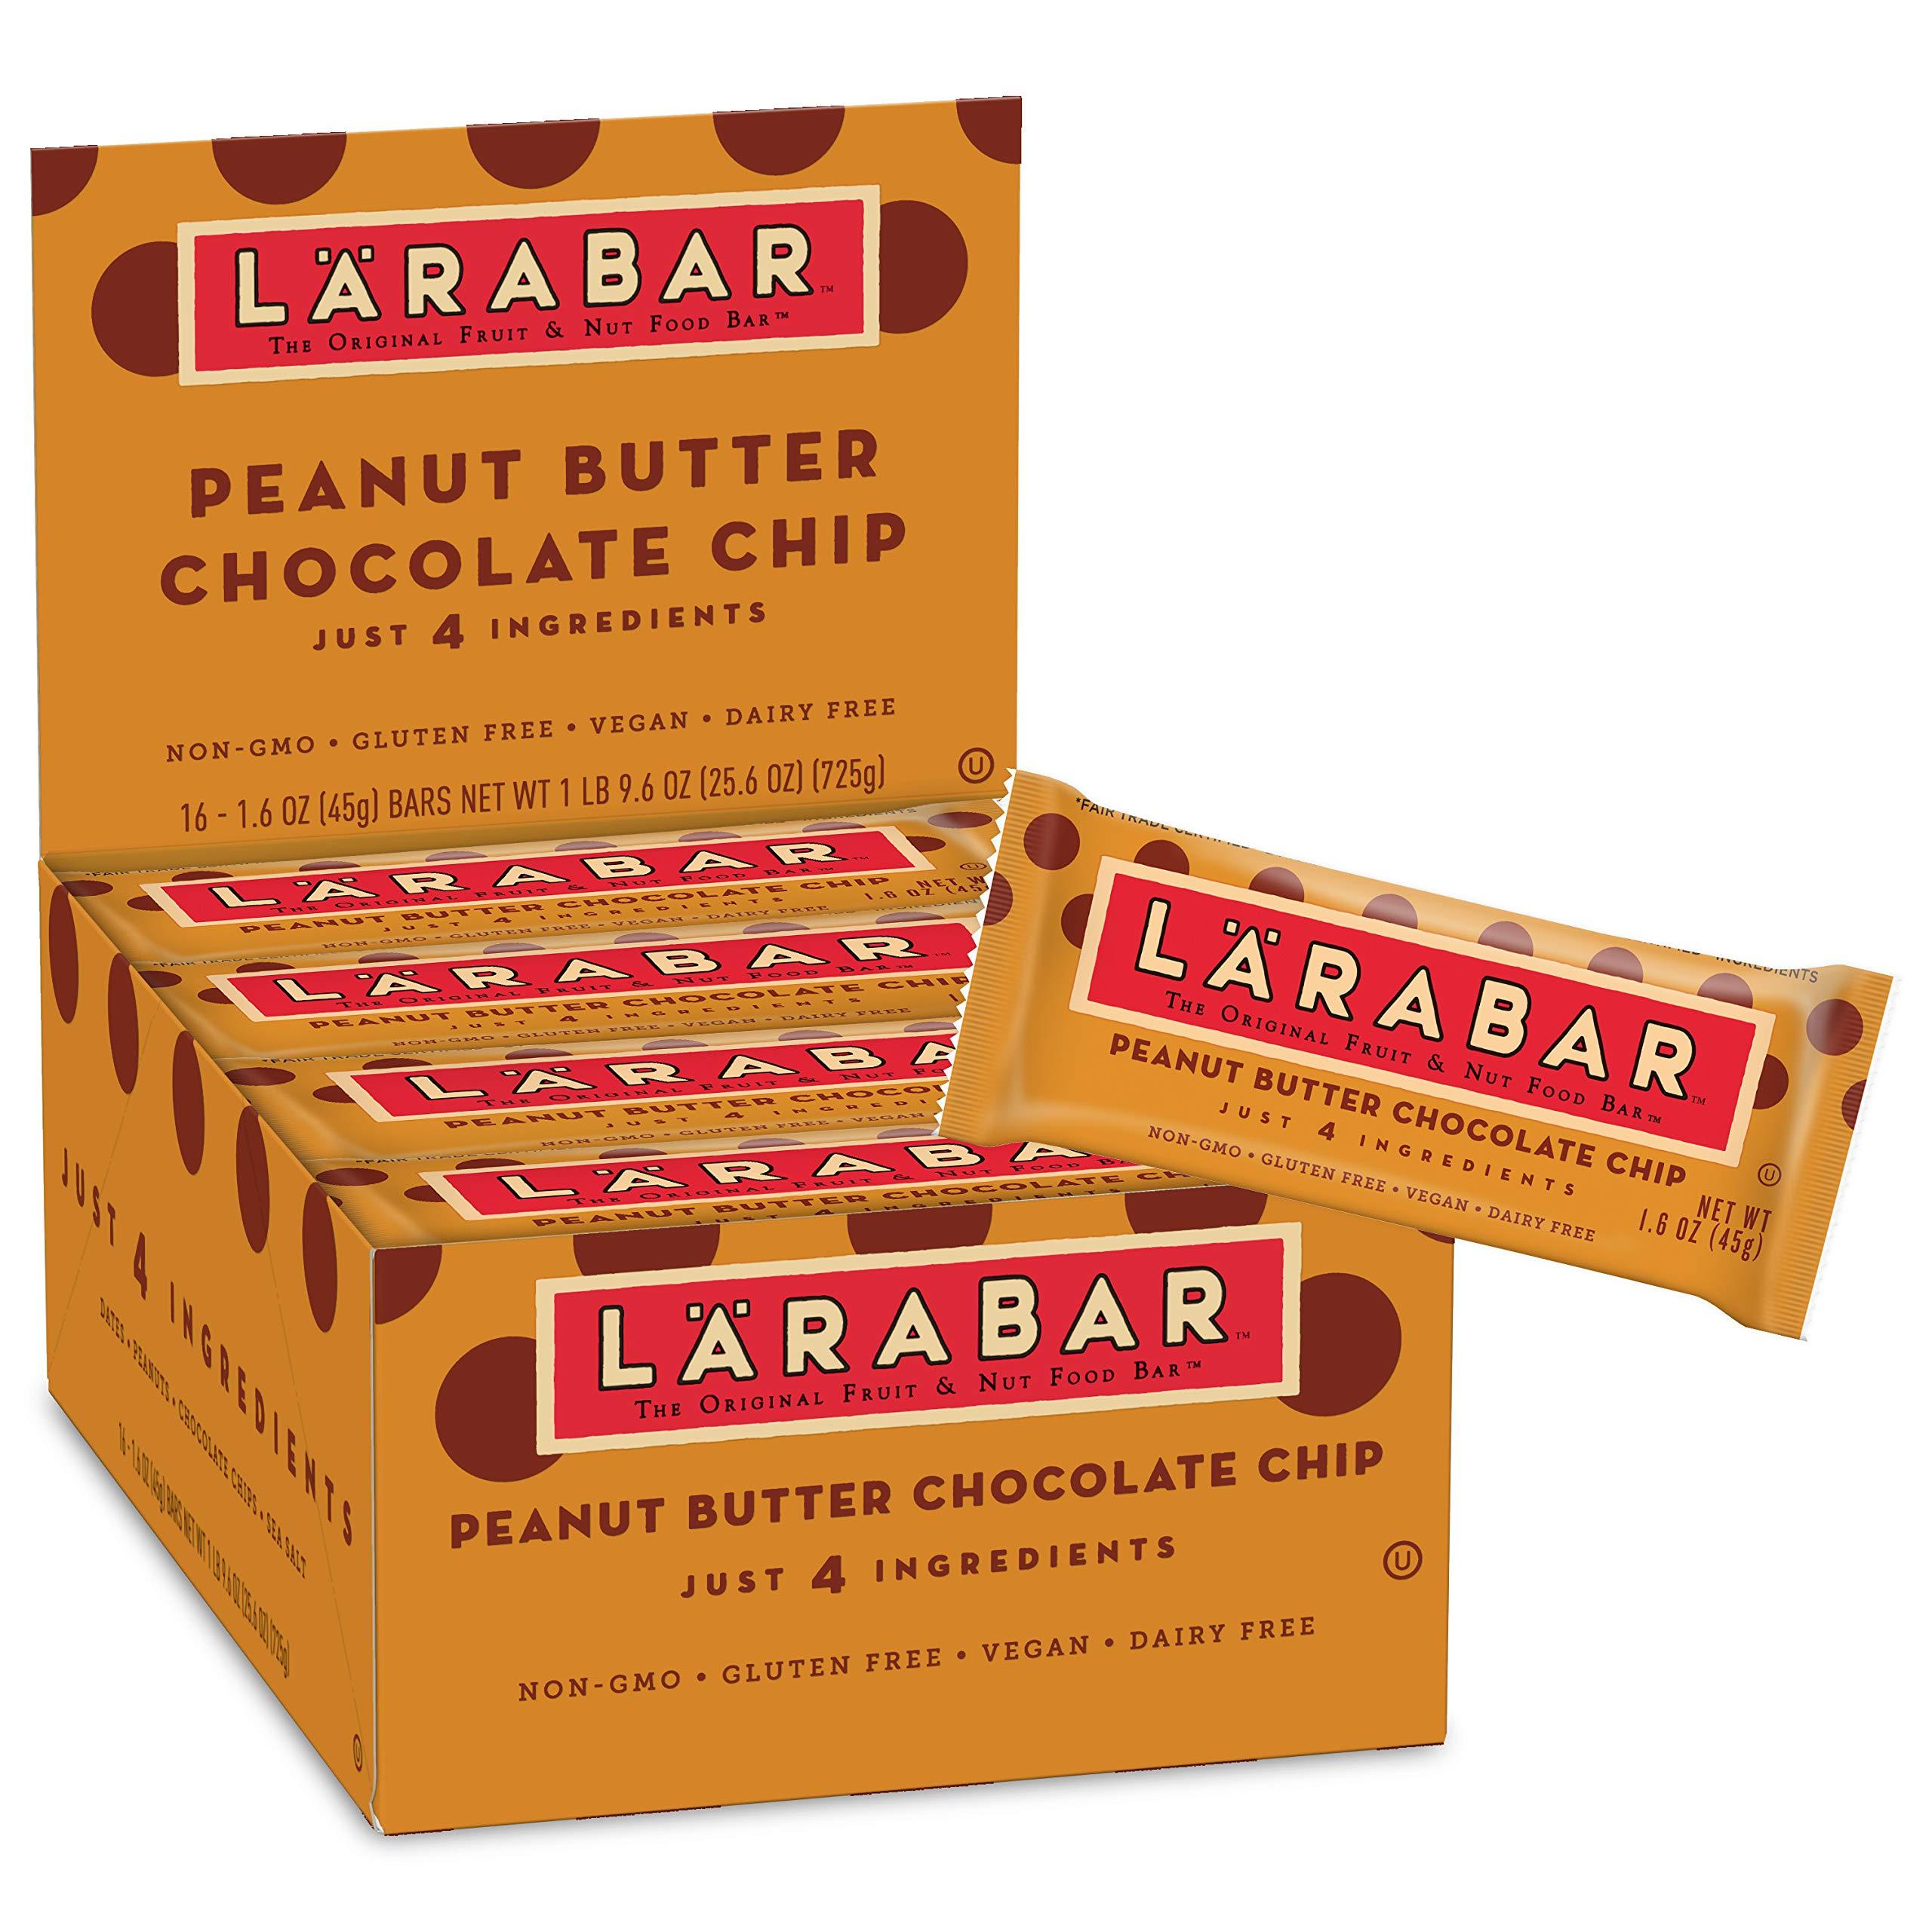 Larabar Gluten Free Bar, Peanut Butter Chocolate Chip, 1.6 oz Bars (16 Count) by LÄRABAR